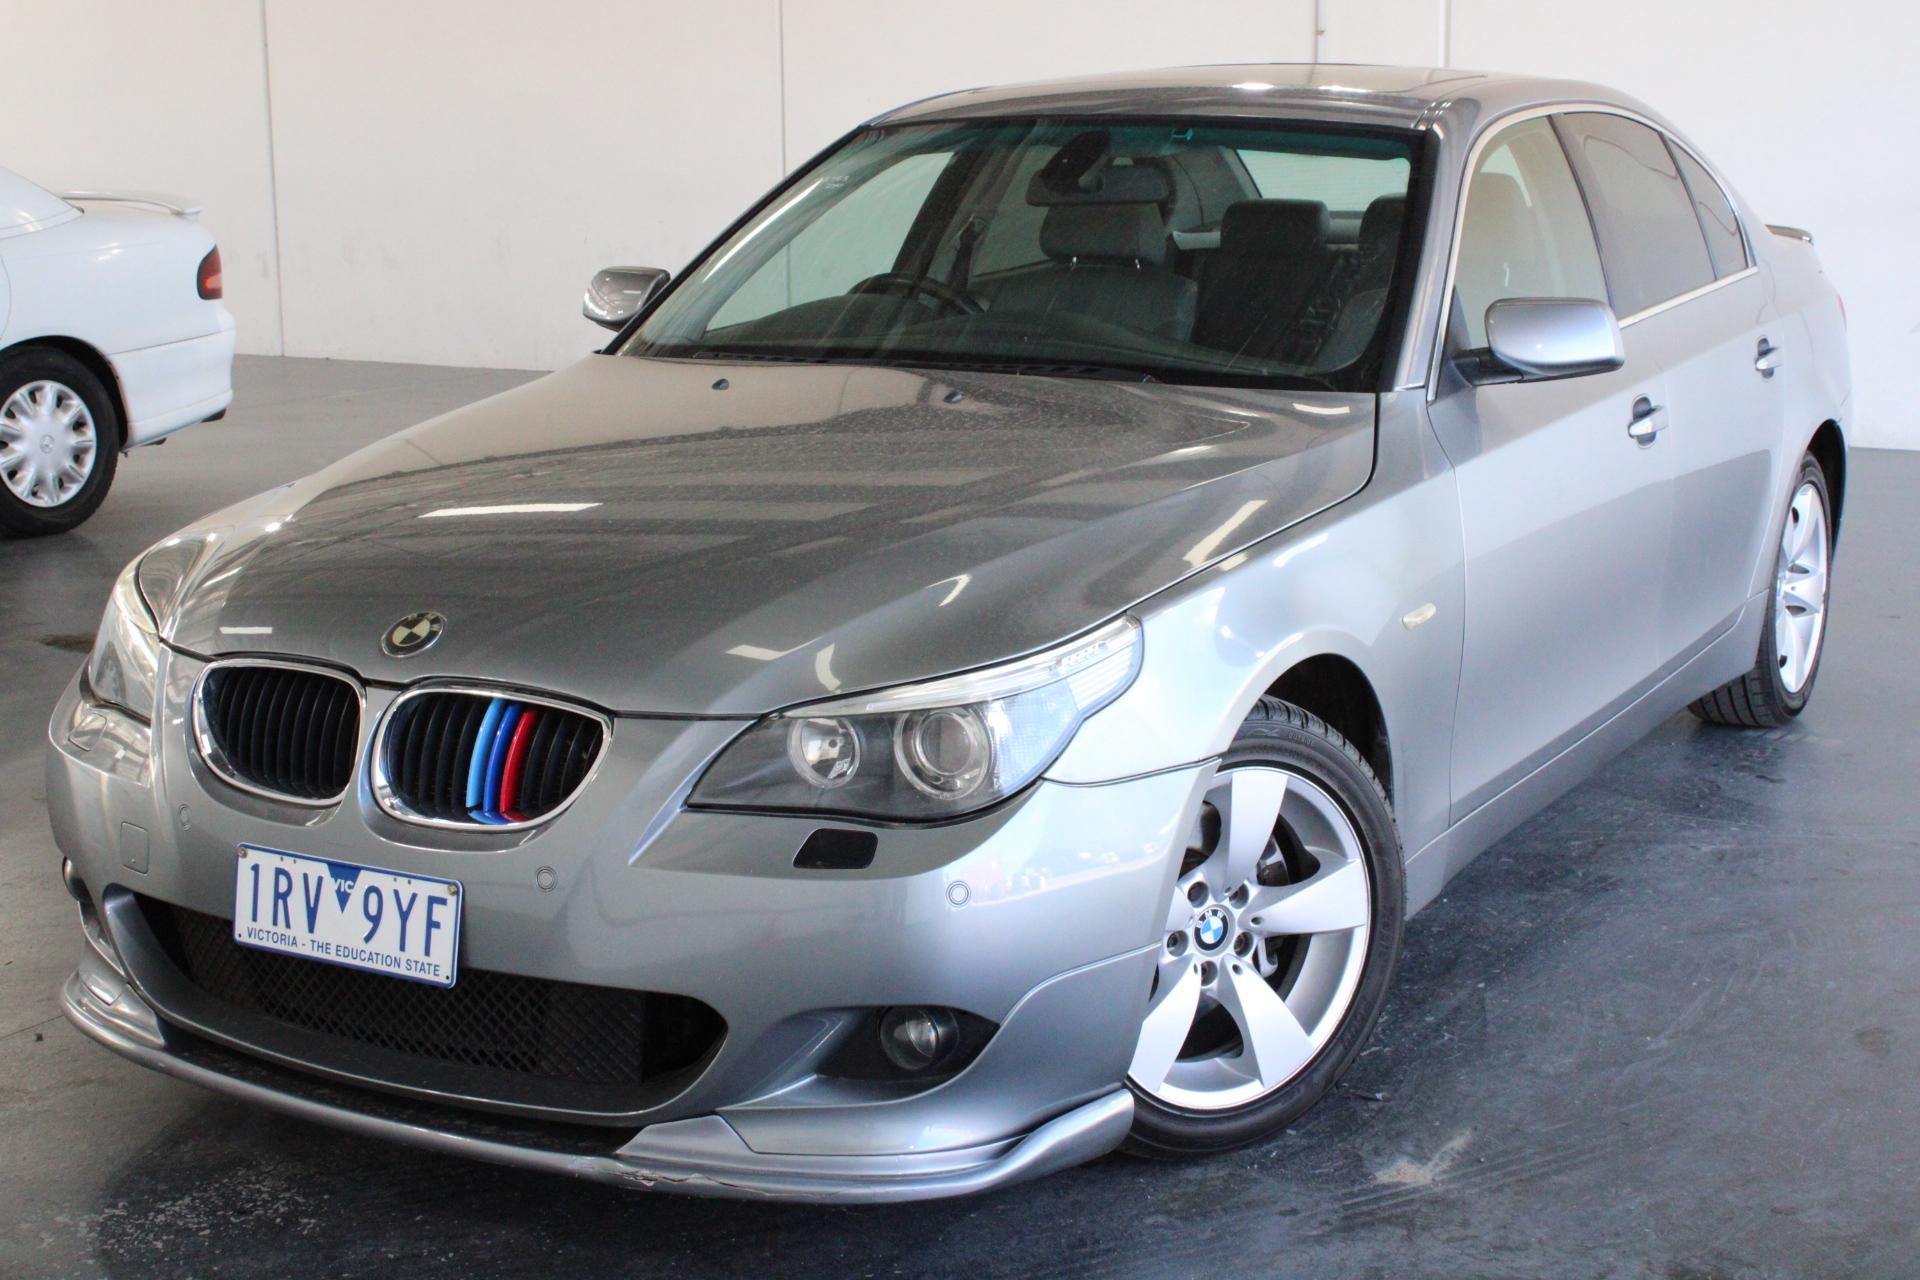 2004 BMW 5 30i E60 Automatic Sedan(WOVR-Inspected)